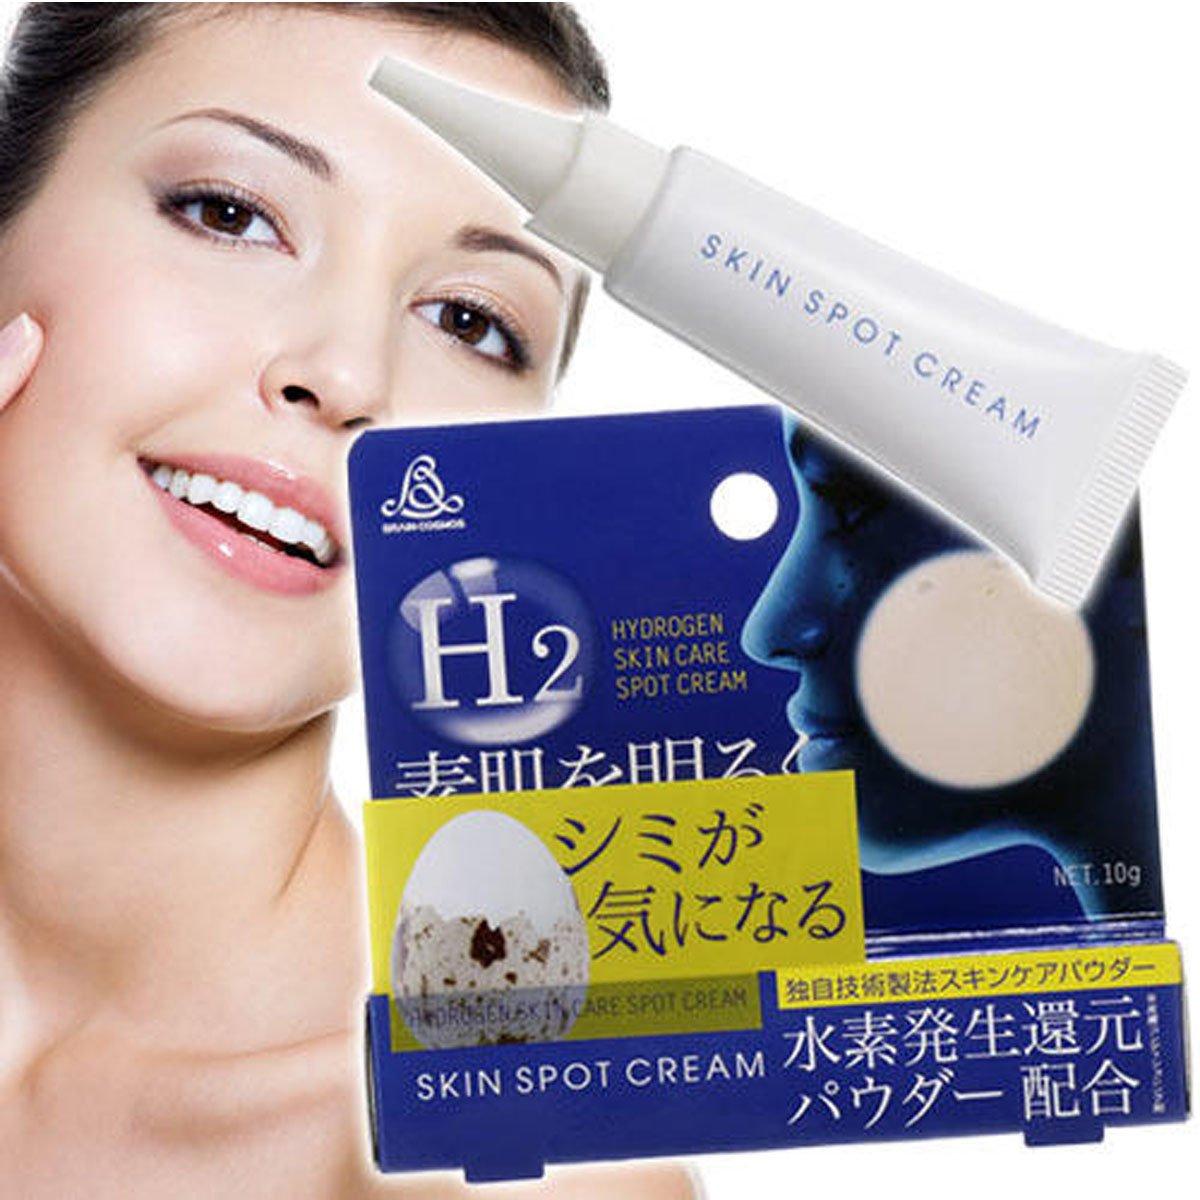 Kem trị nám H2 Hydrogen kin Spot Cream 1